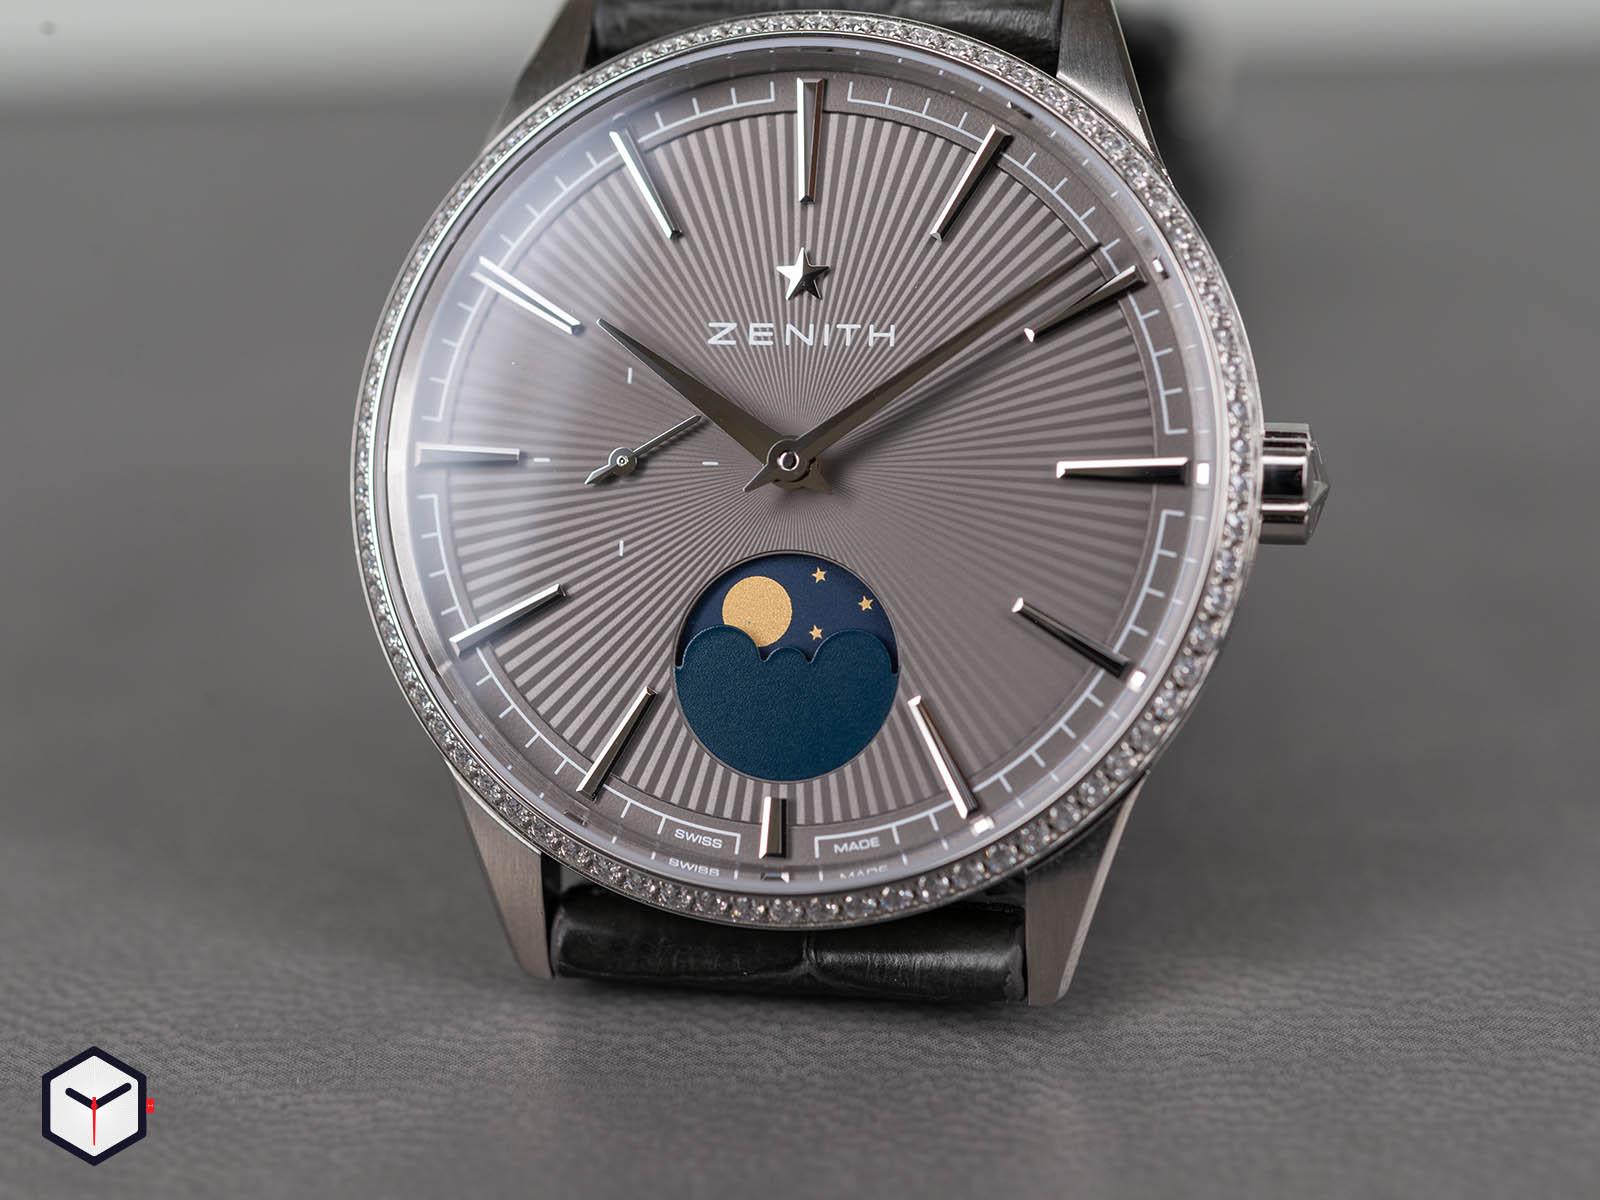 16-3200-692-03-c833-zenith-elite-moonphase-3.jpg